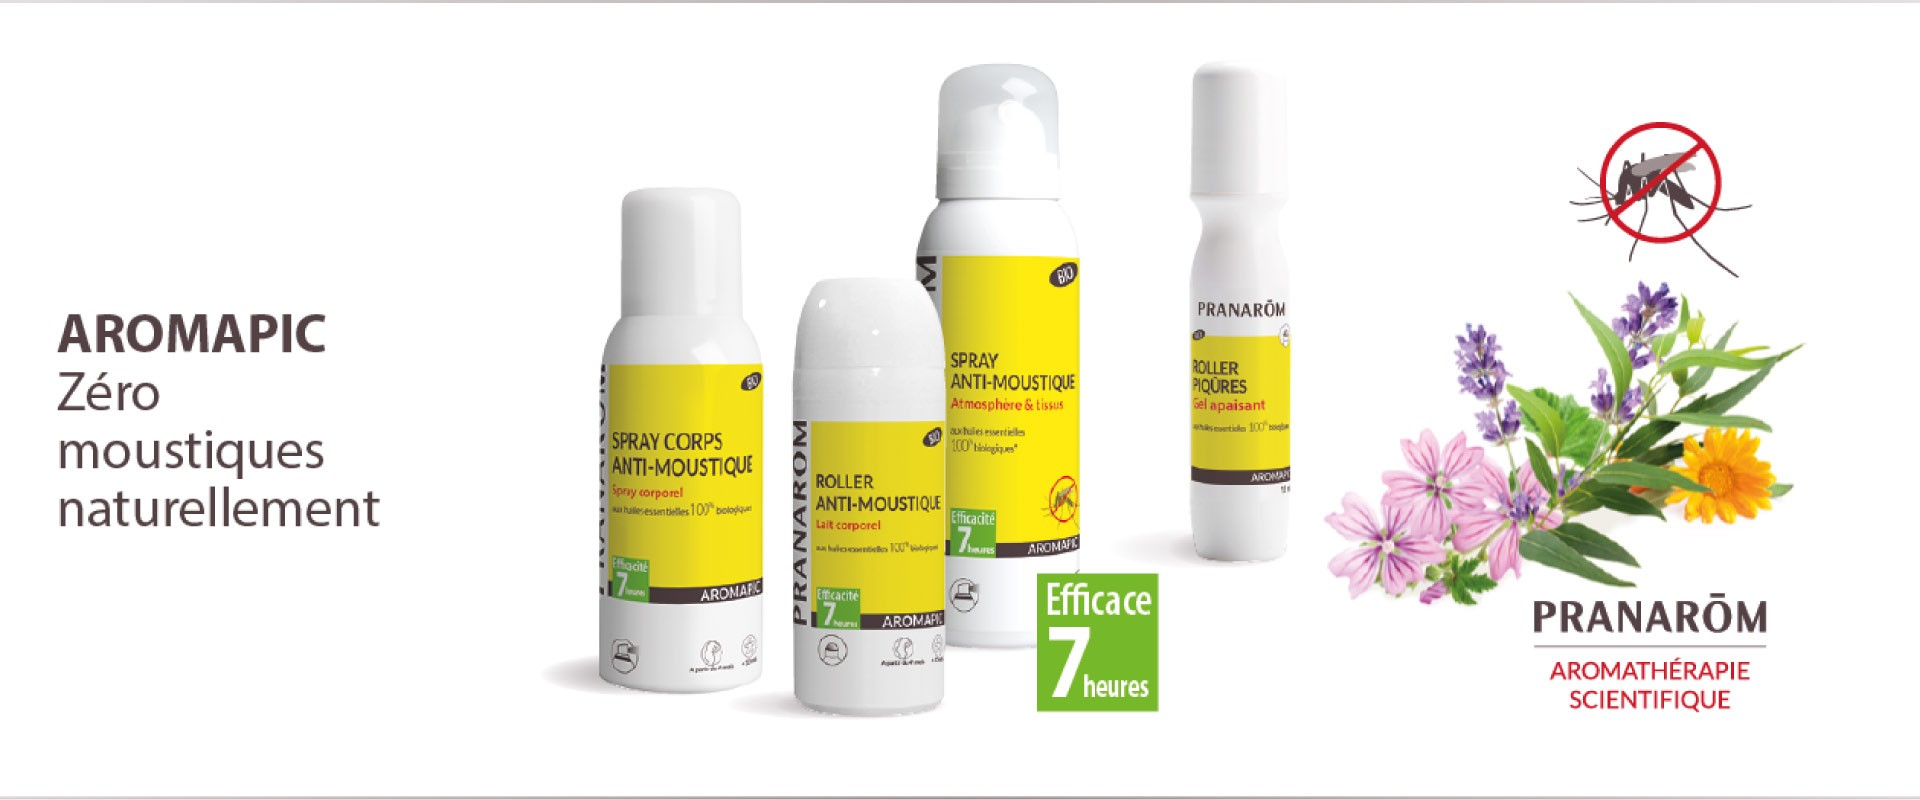 huiles-essentielles-pranarom-Marconne-hesdin-Marconnelle-pharmacie-de-l-avenue